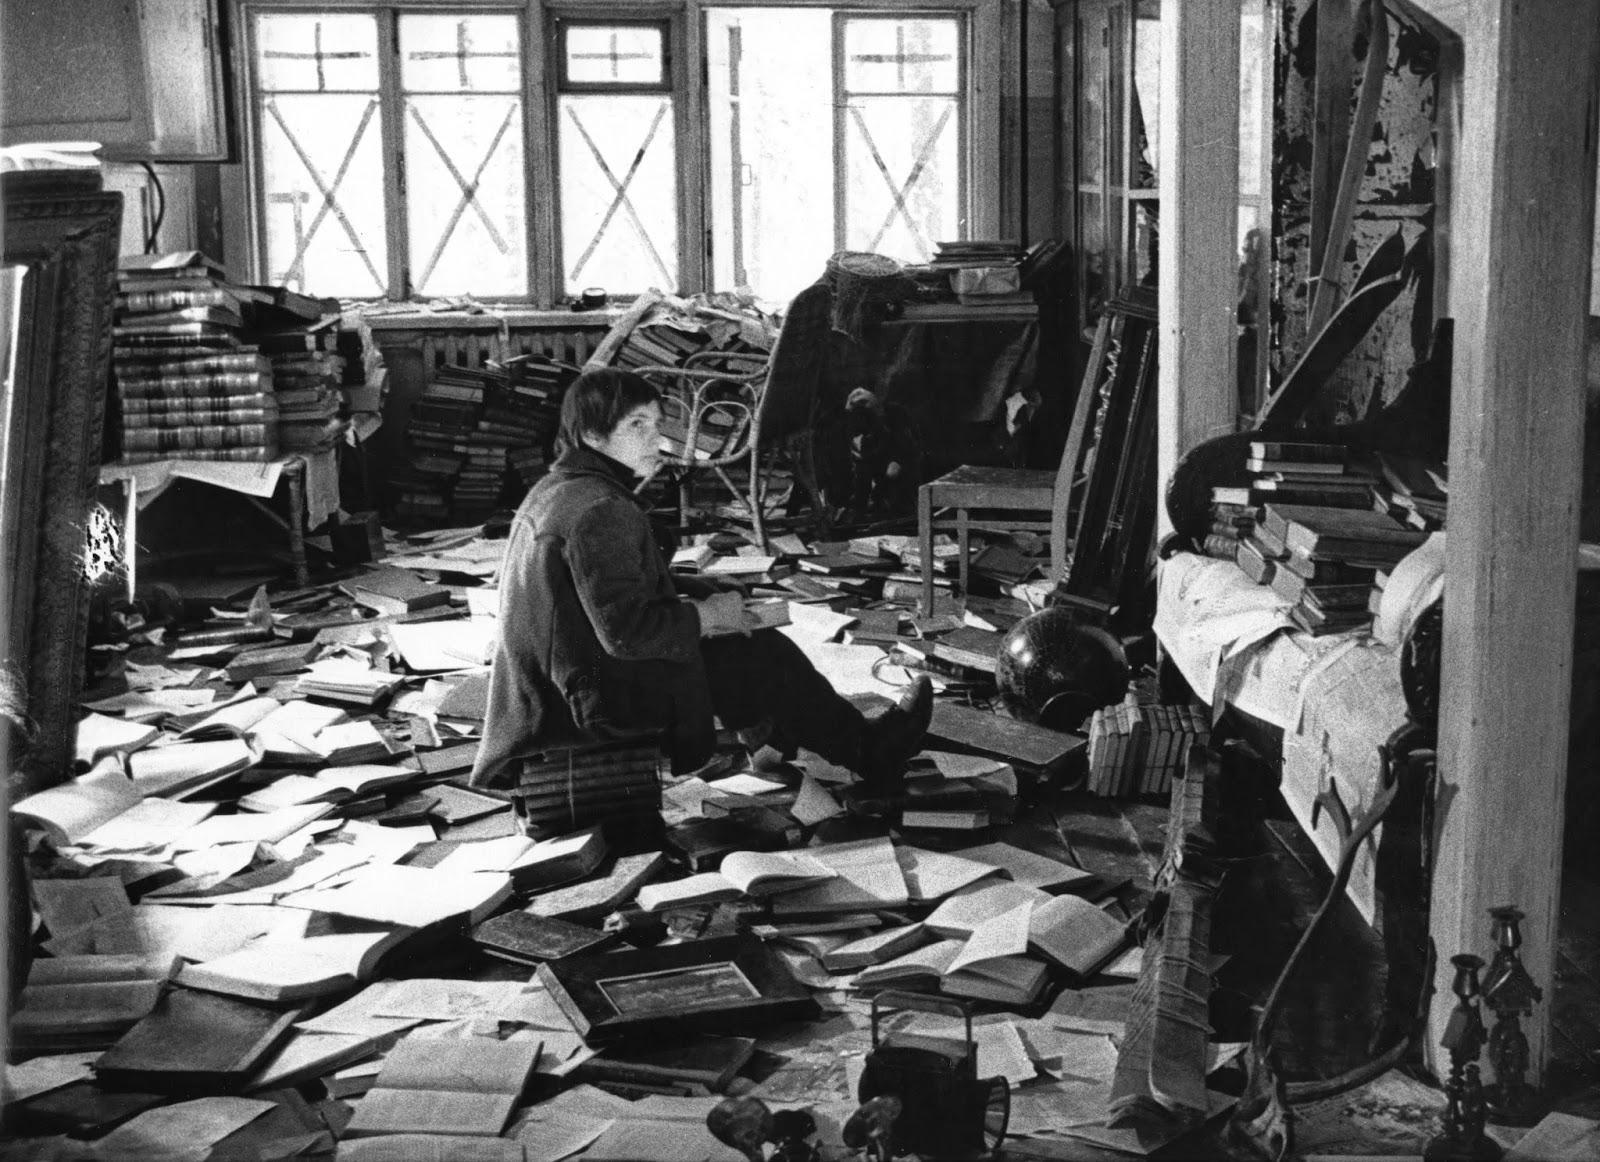 Beyond the Looking Glass: Andrei Tarkovsky's Mirror (Part II